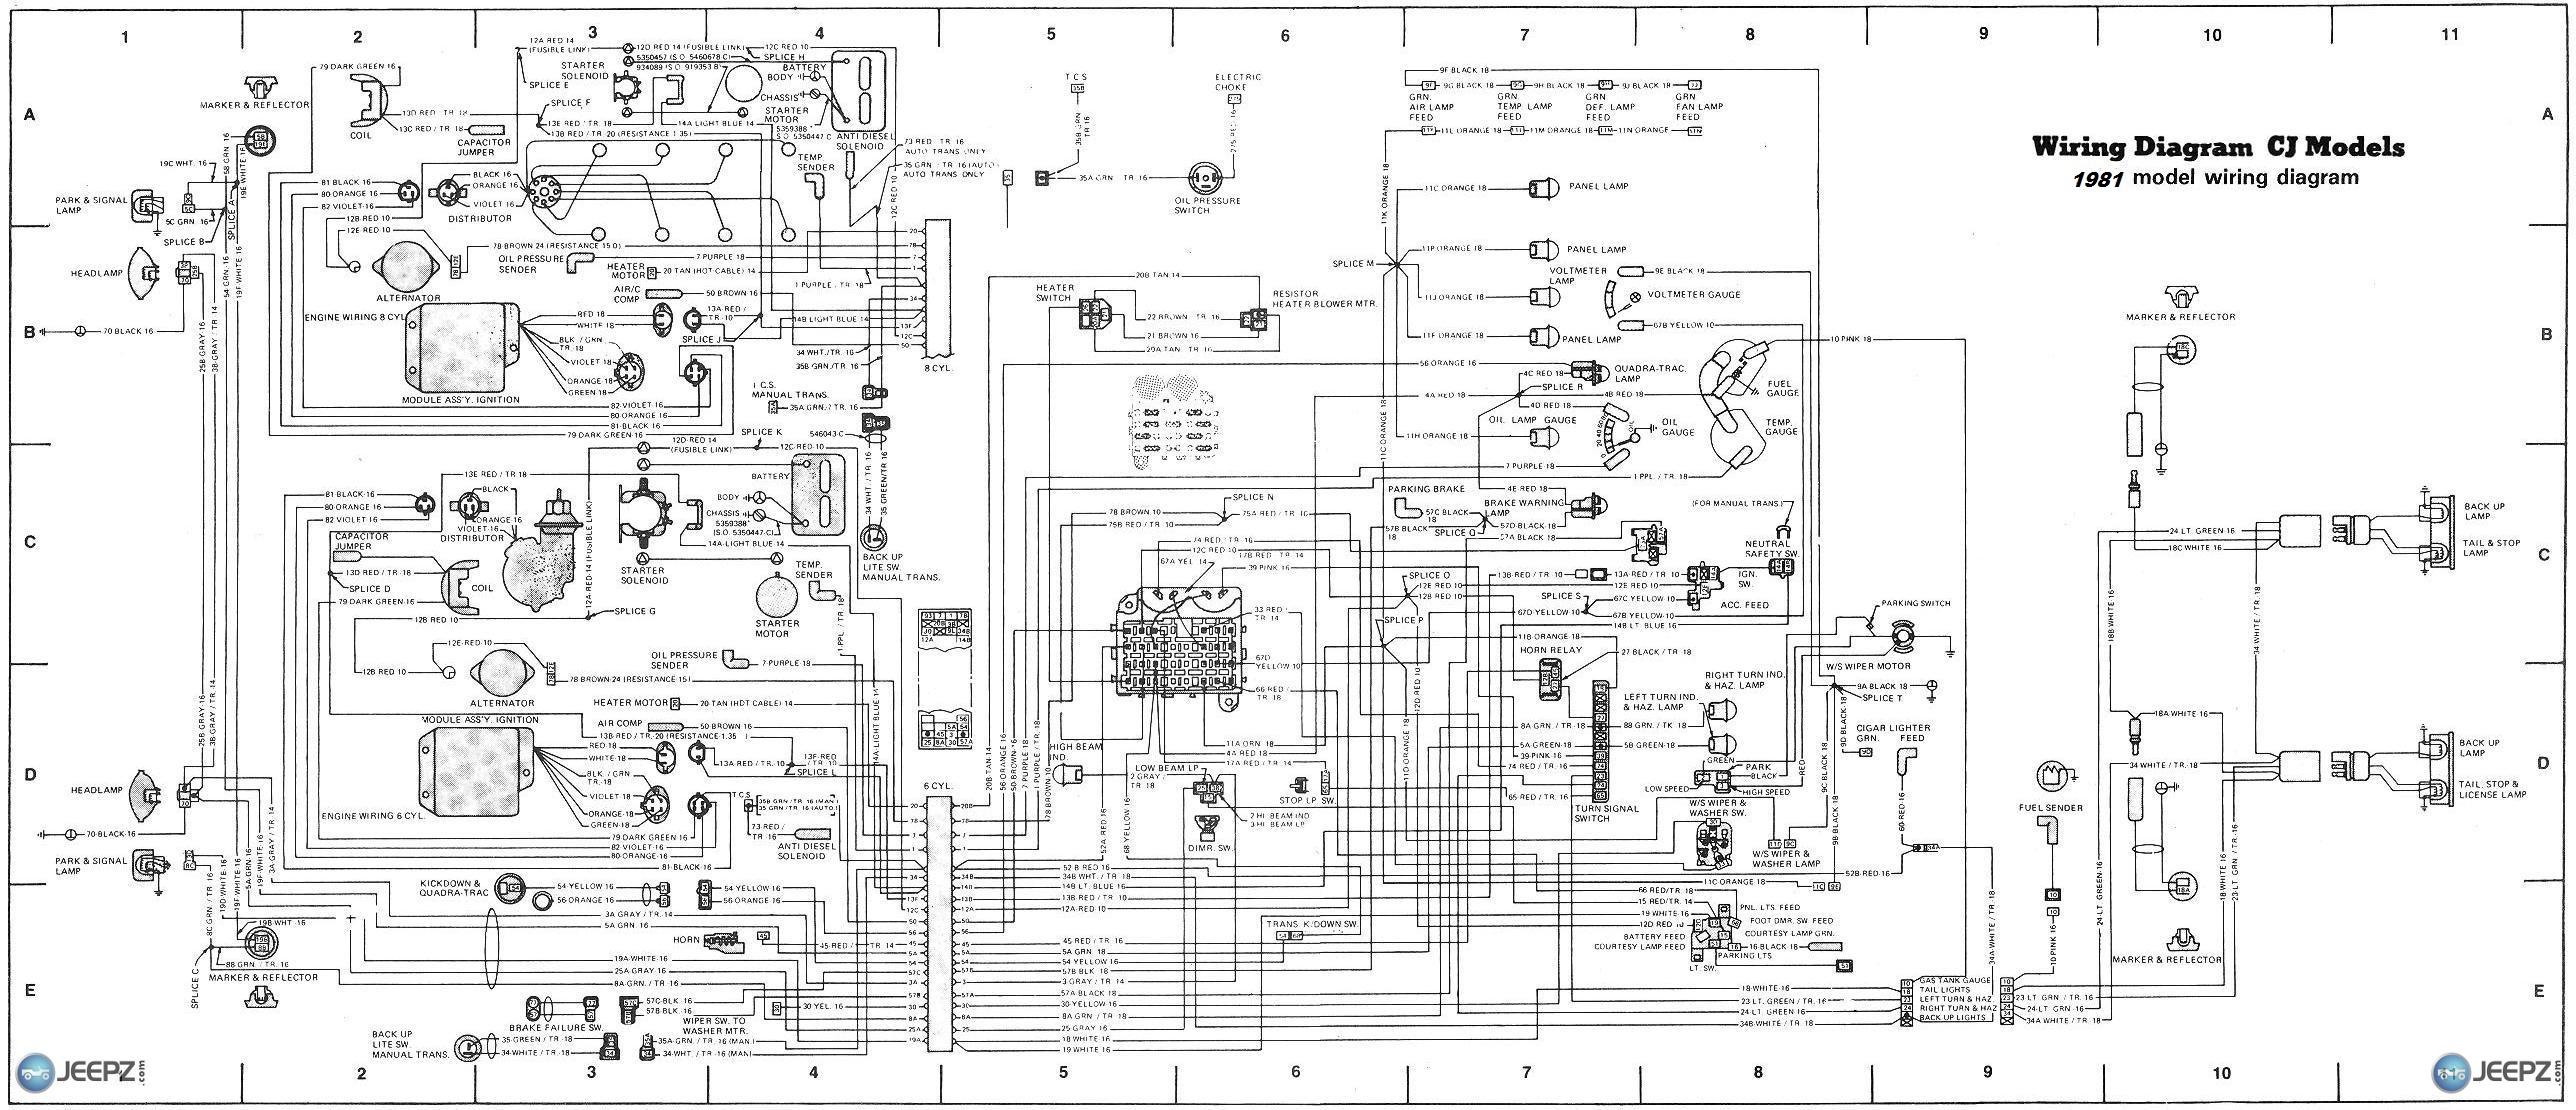 Wiring Harness For 1969 Jeep Cj5 Wiring Diagram Report A Report A Maceratadoc It